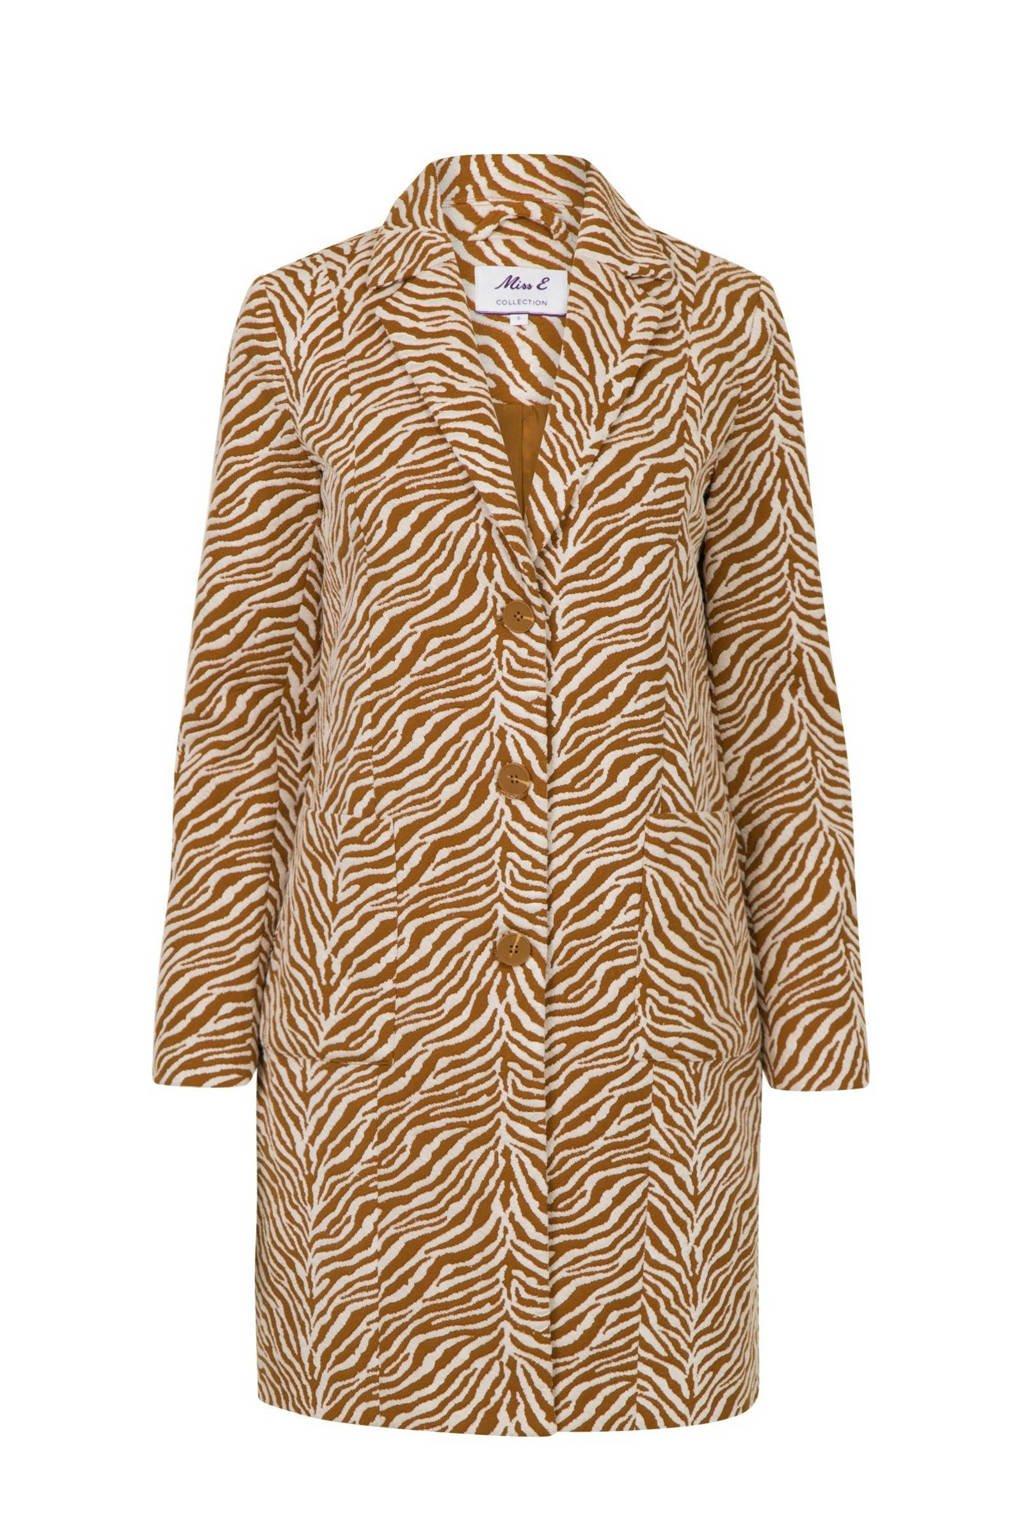 Miss Etam Regulier coat met zebraprint bruin, Bruin